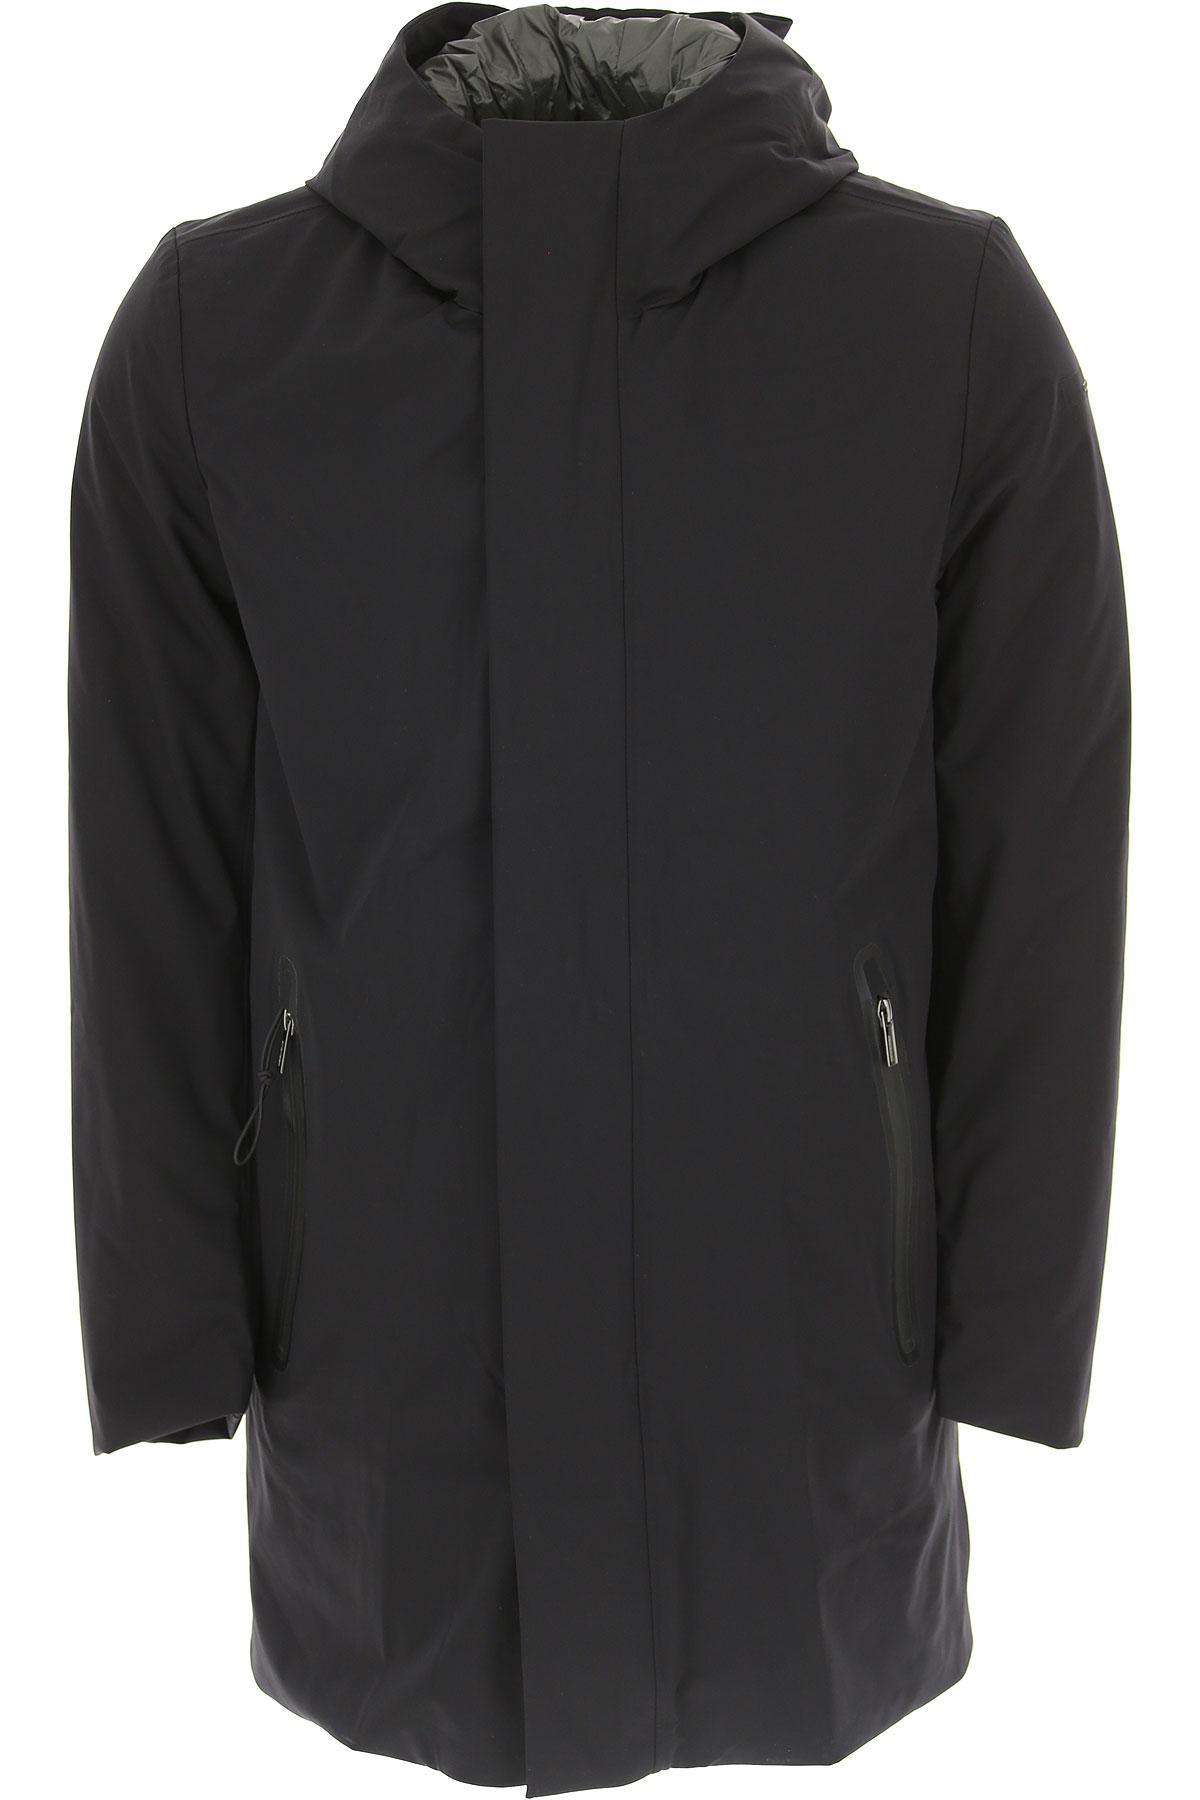 Image of Fay Down Jacket for Men, Puffer Ski Jacket, Black, polyamide, 2017, L M